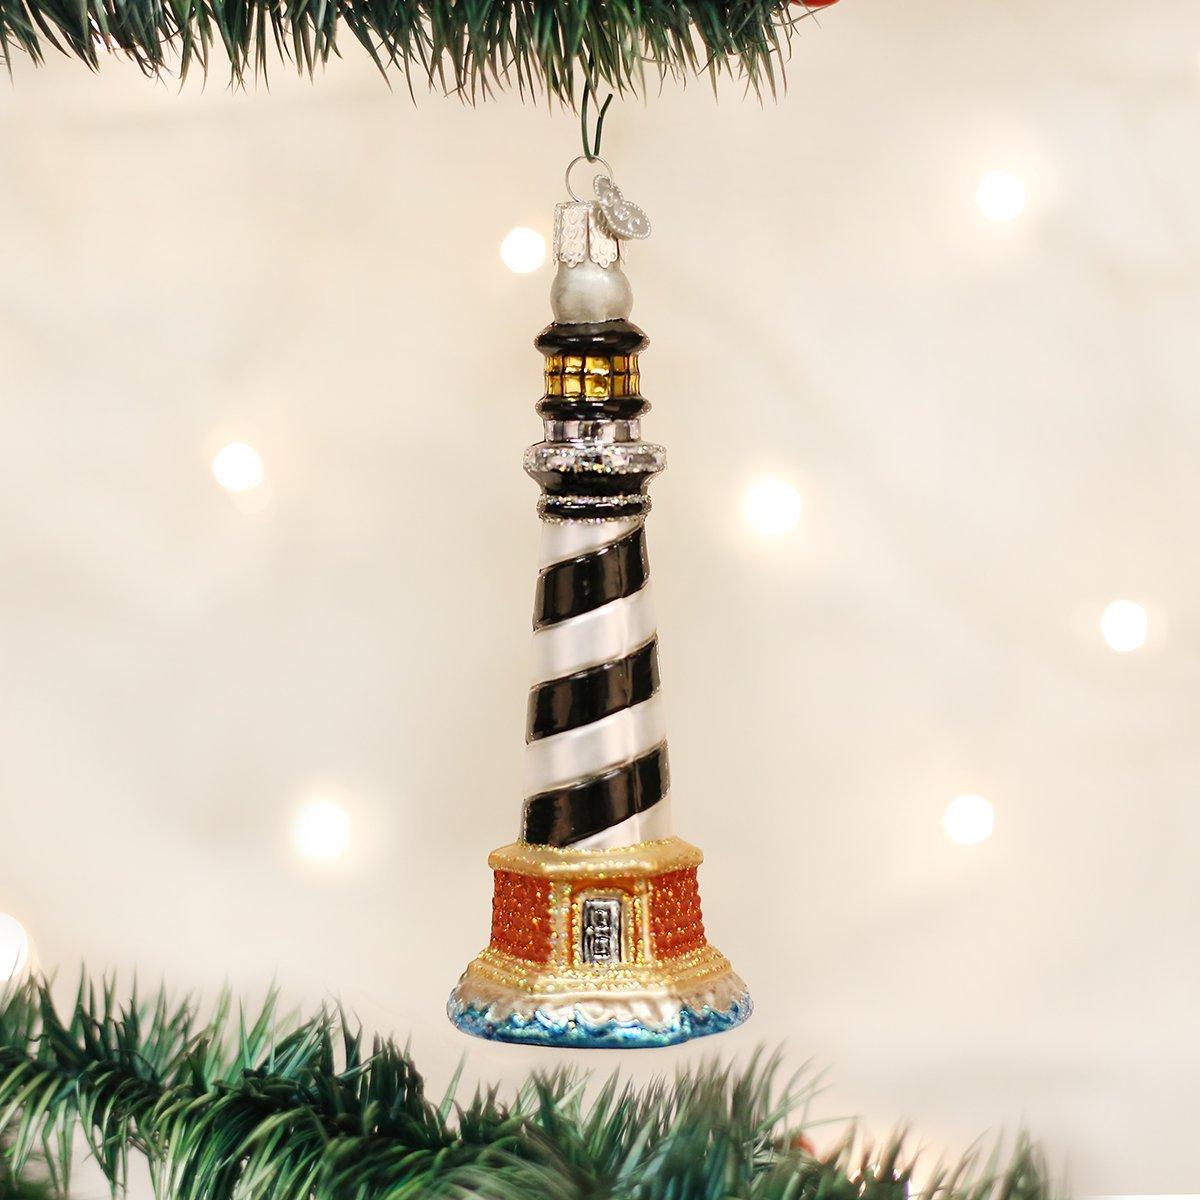 Old World Christmas Holiday Lighthouse Glass Blown Christmas Tree Ornament Nautical